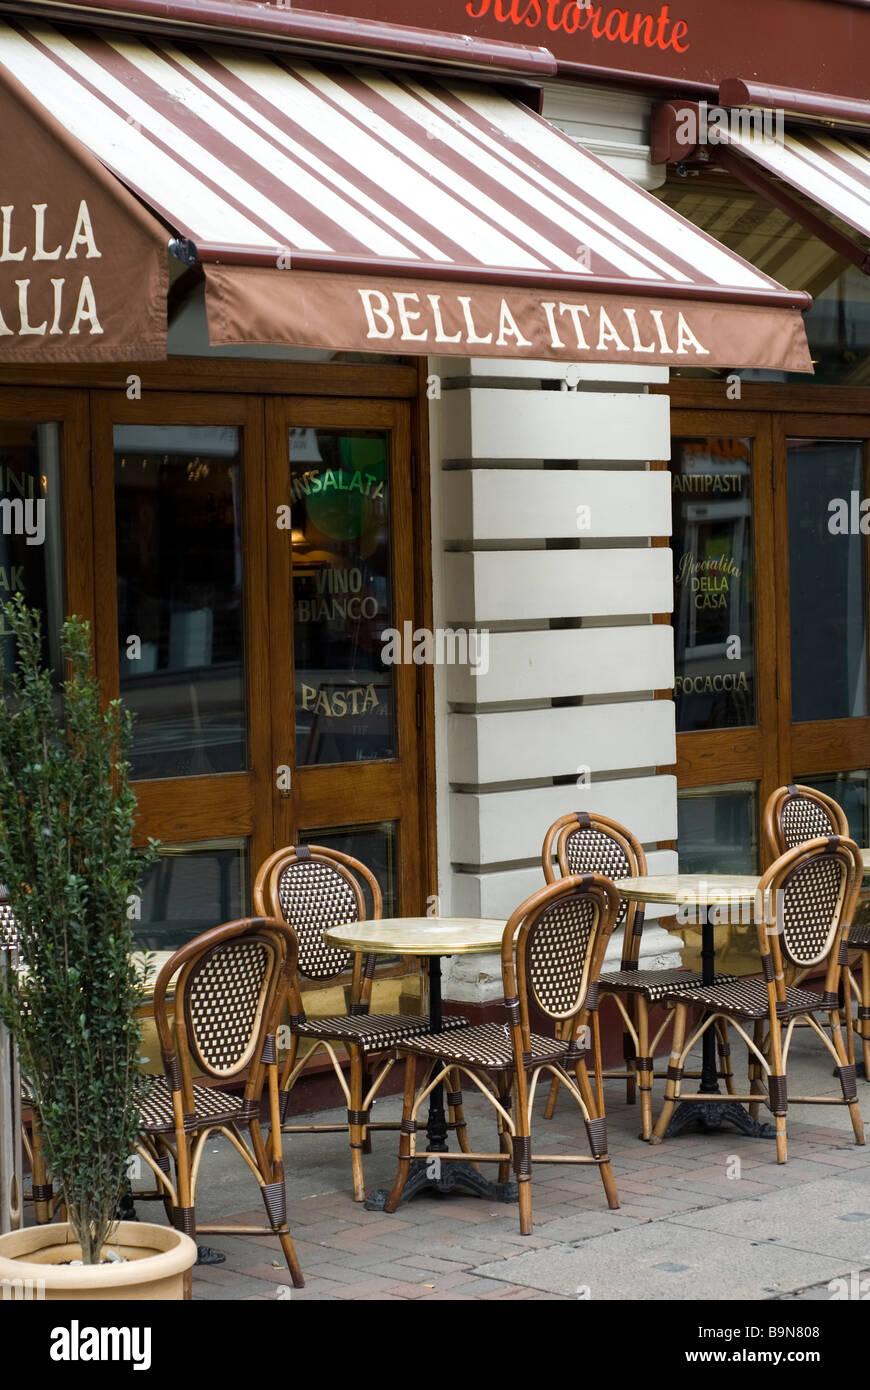 Manchester Restaurants Beella Italian